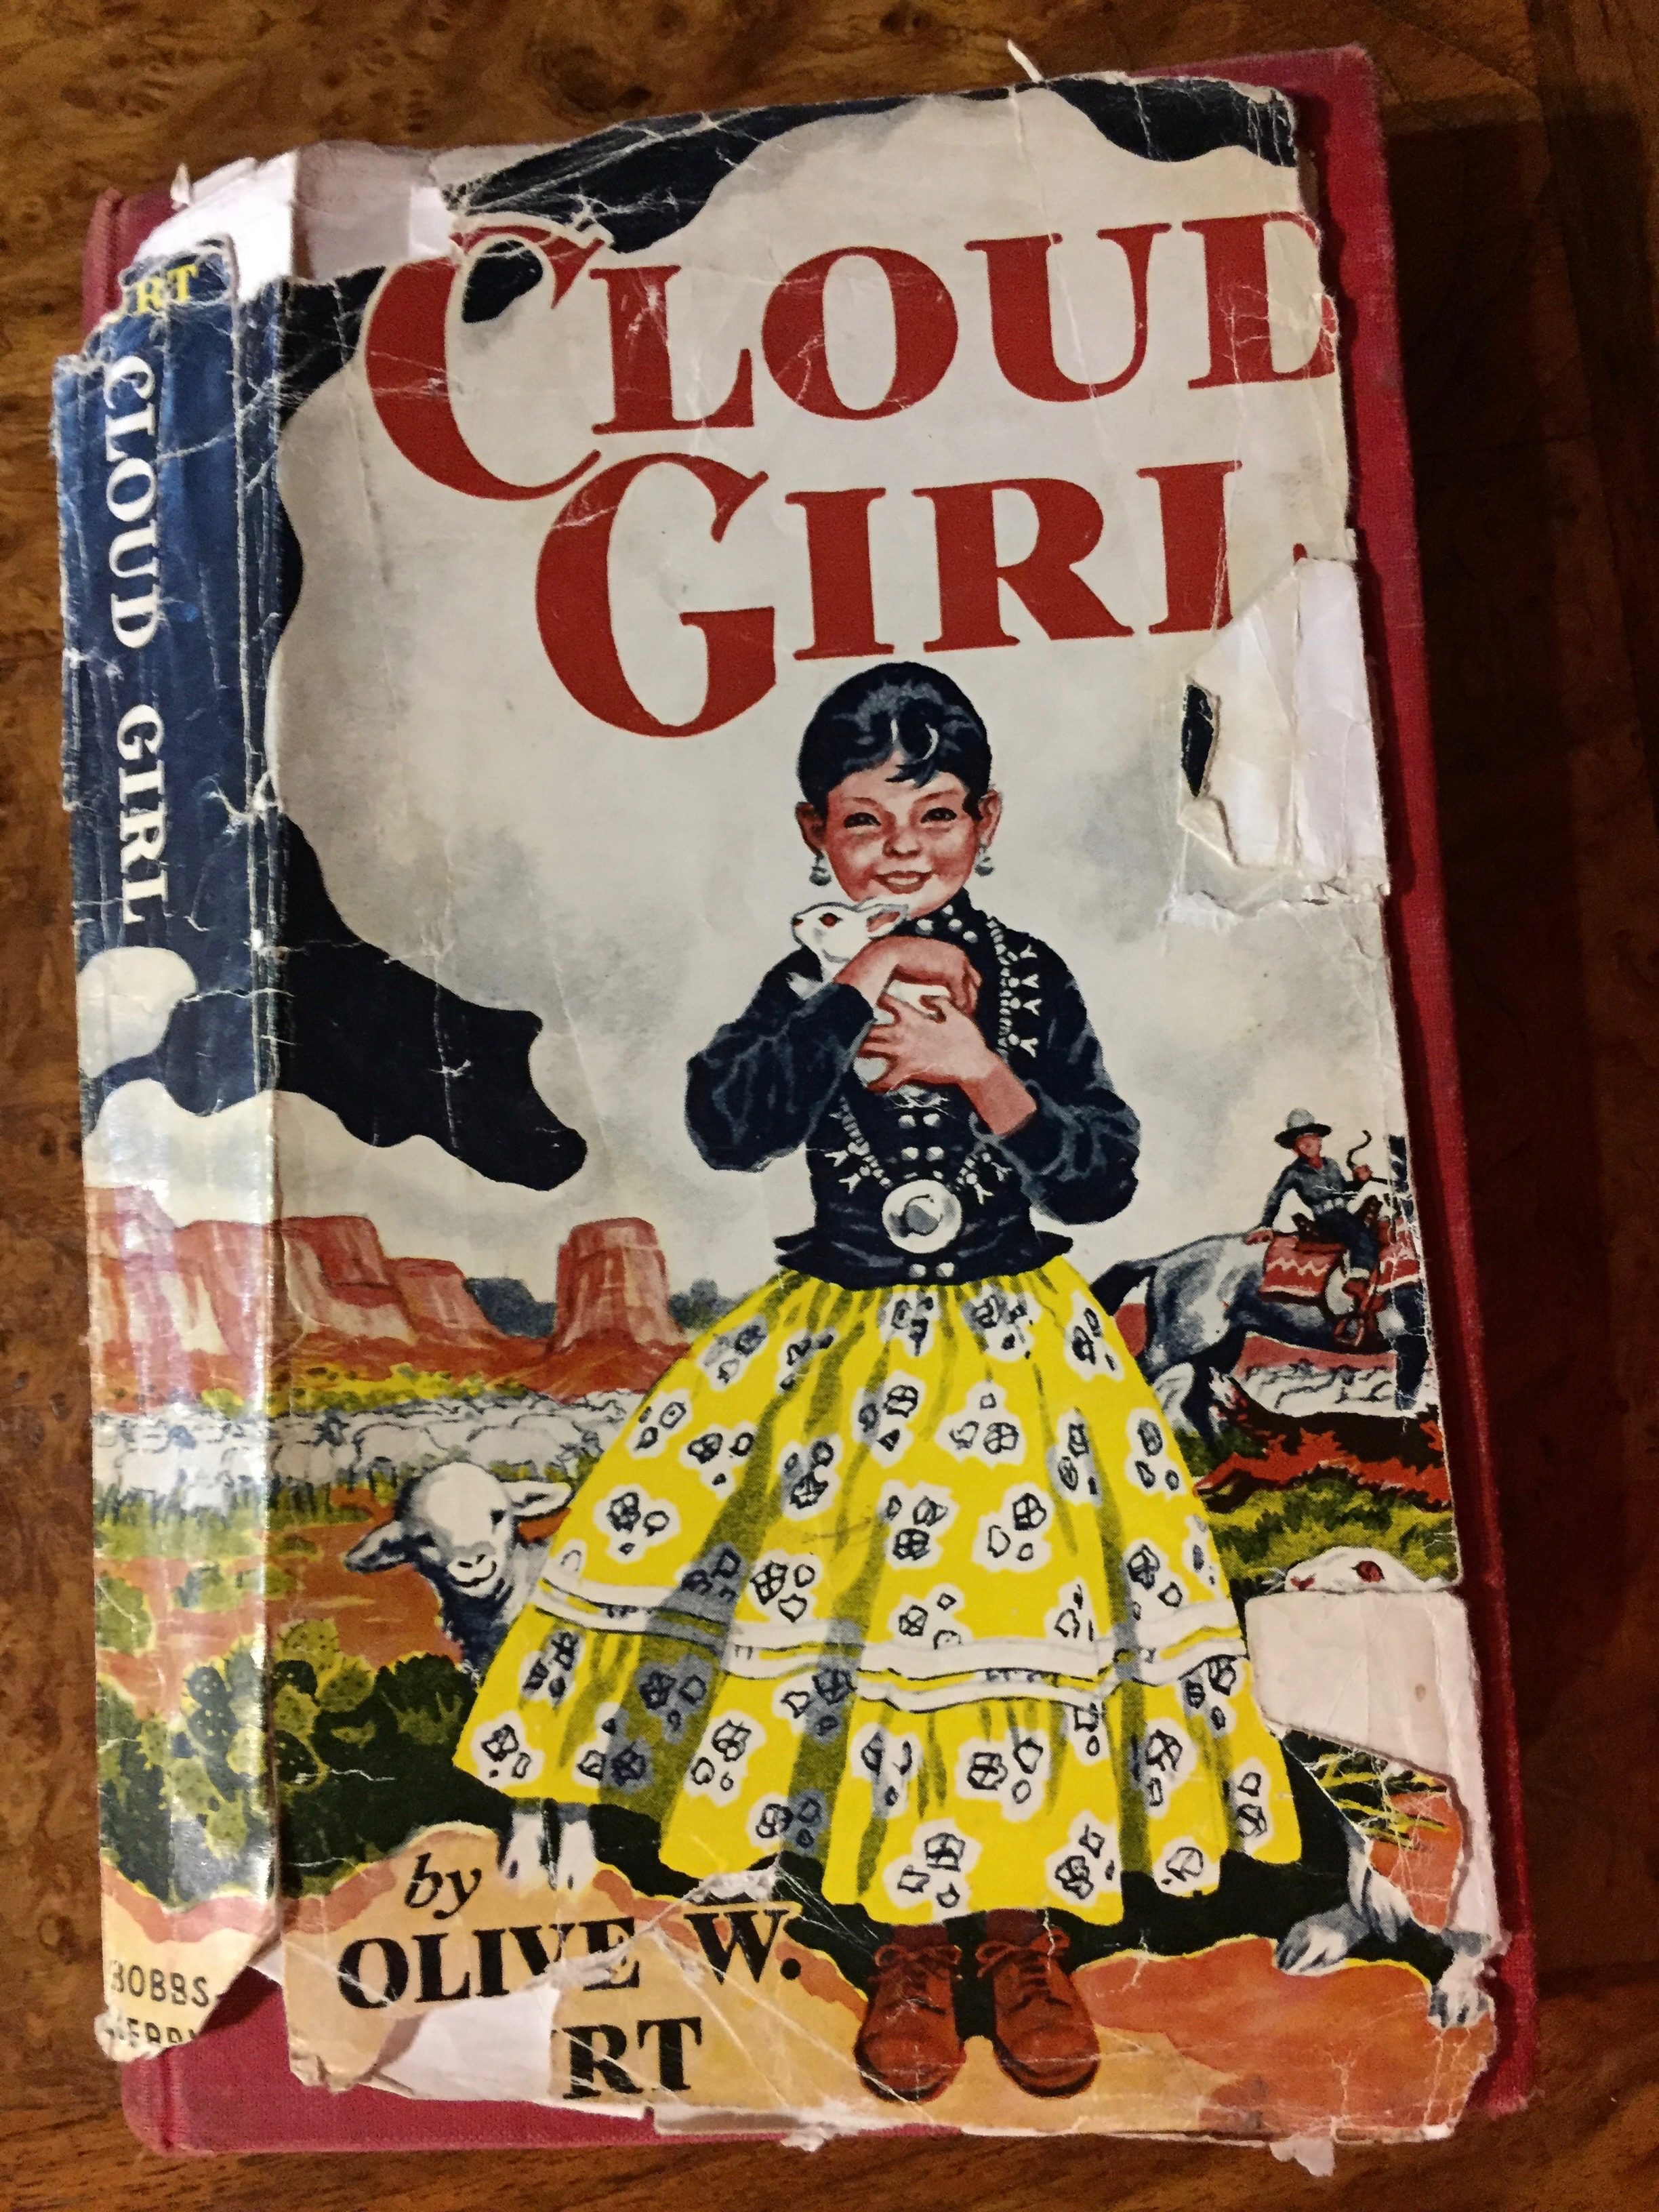 CloudGirl